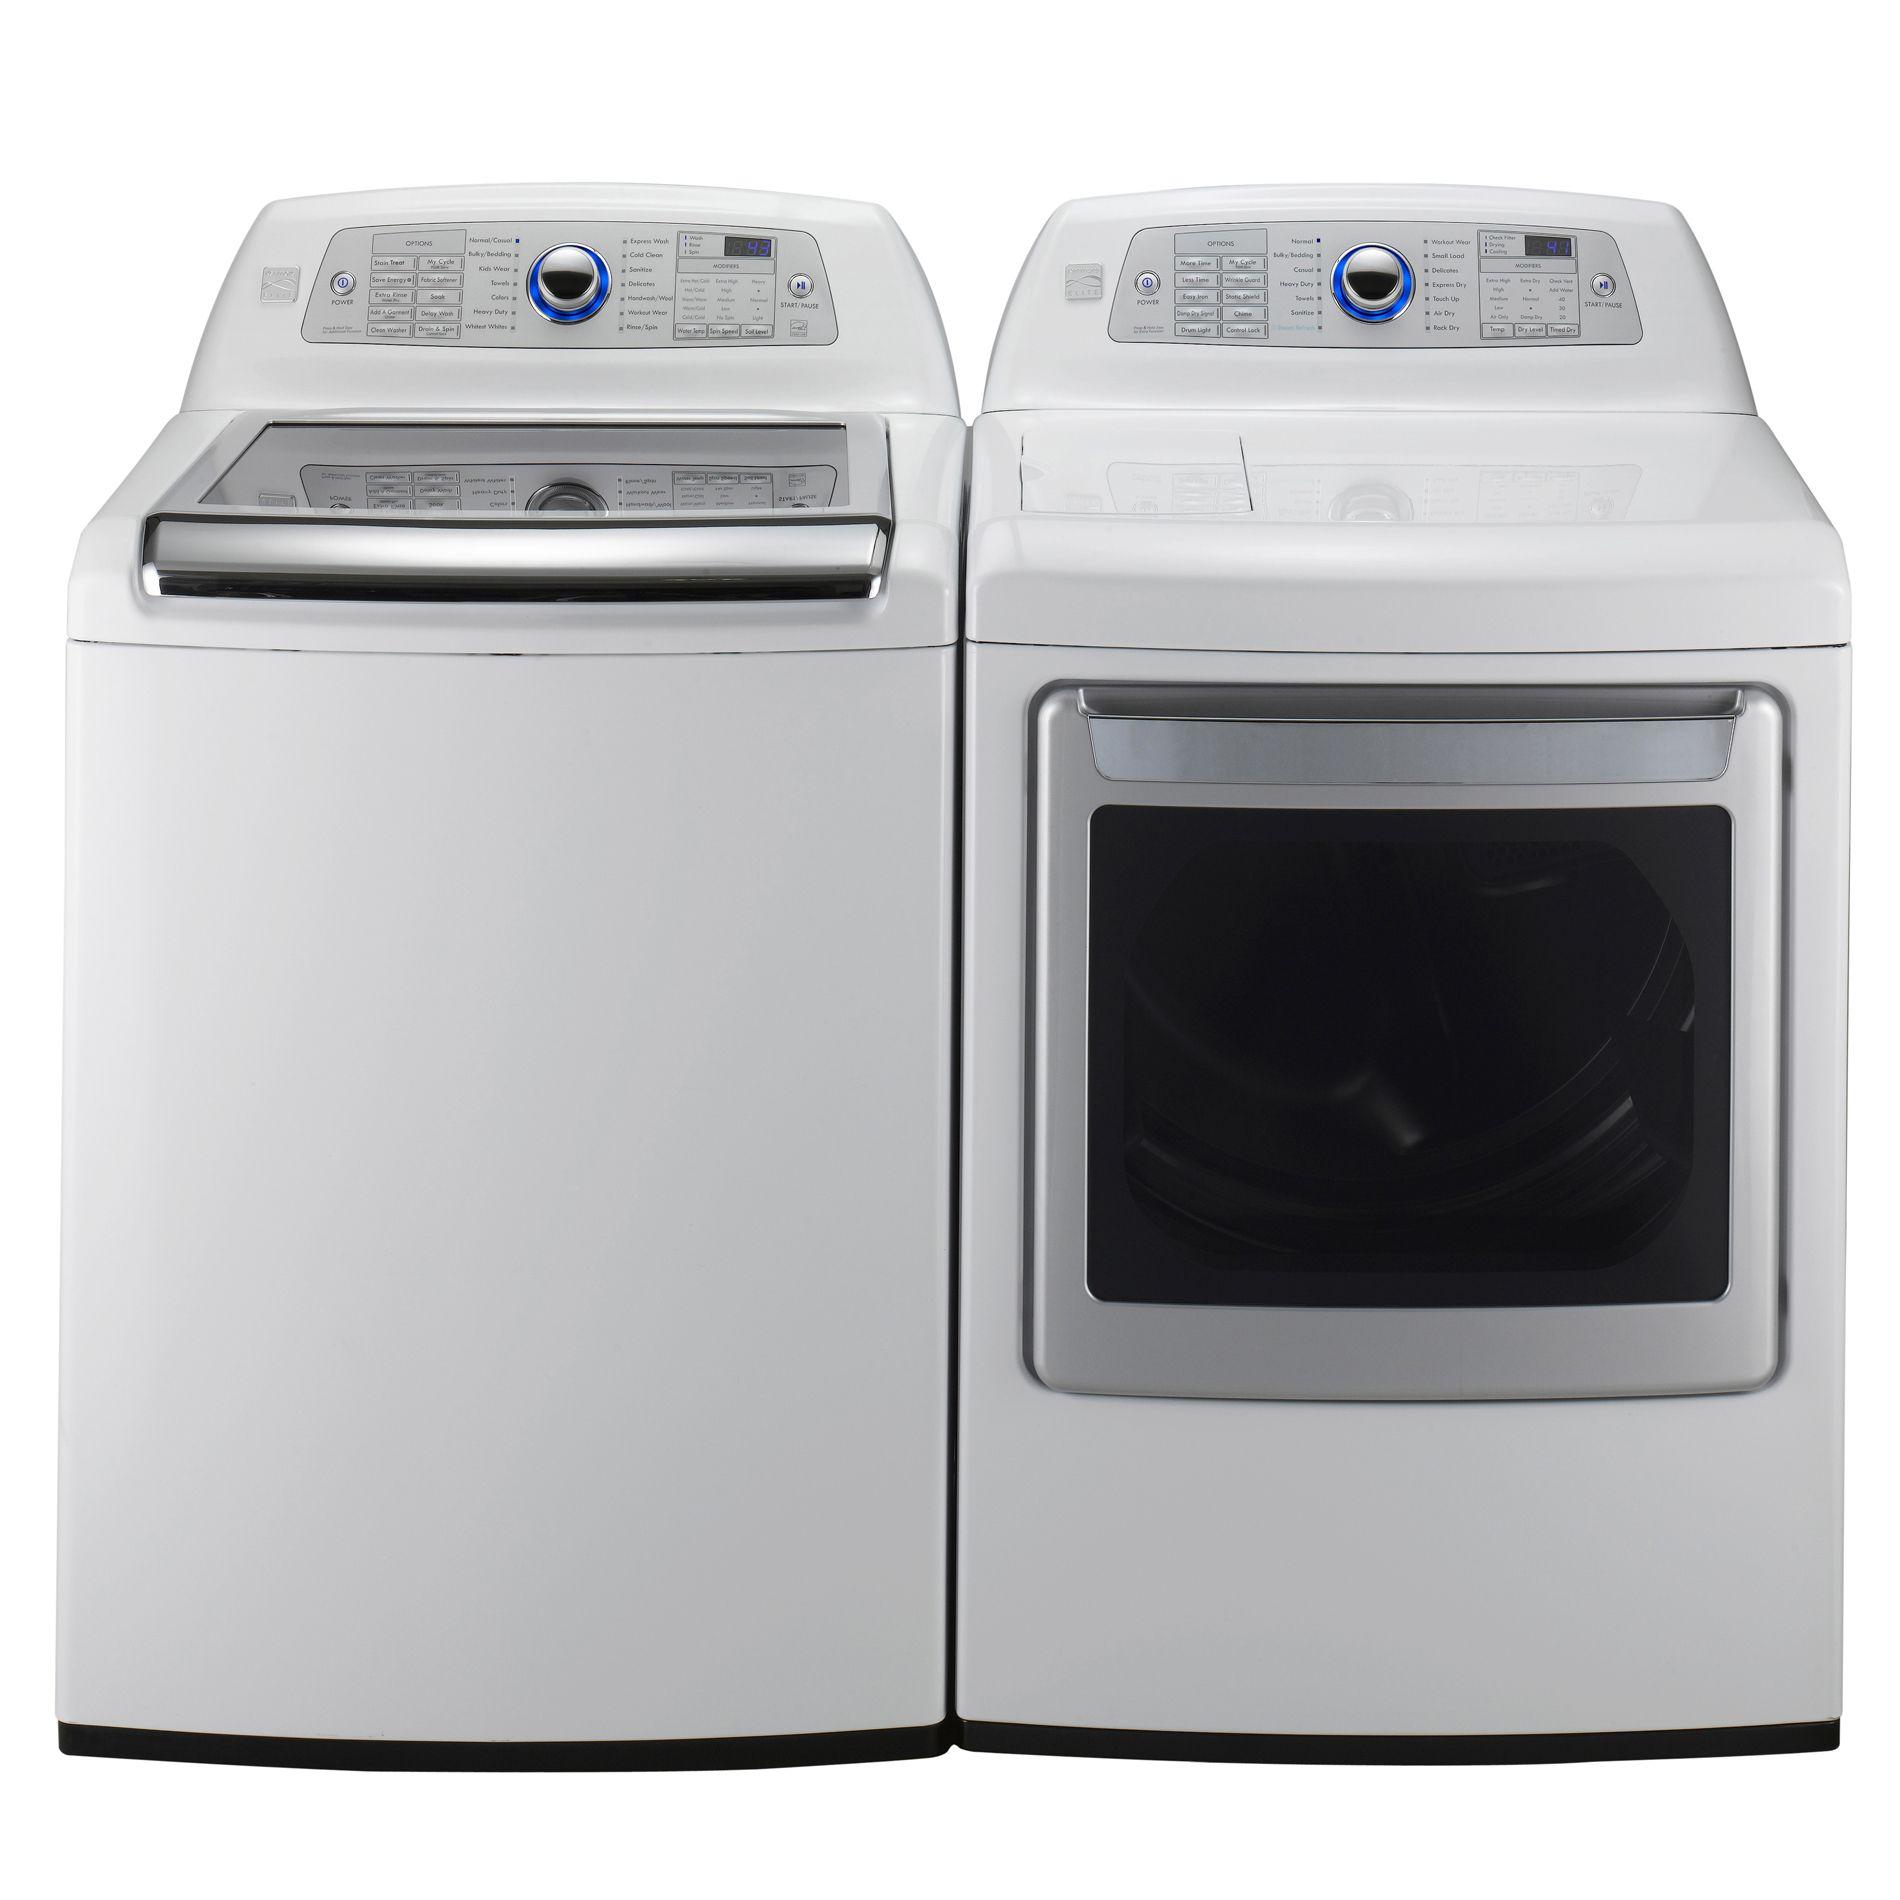 Kenmore Elite 7.3 cu. ft. Steam Gas Dryer